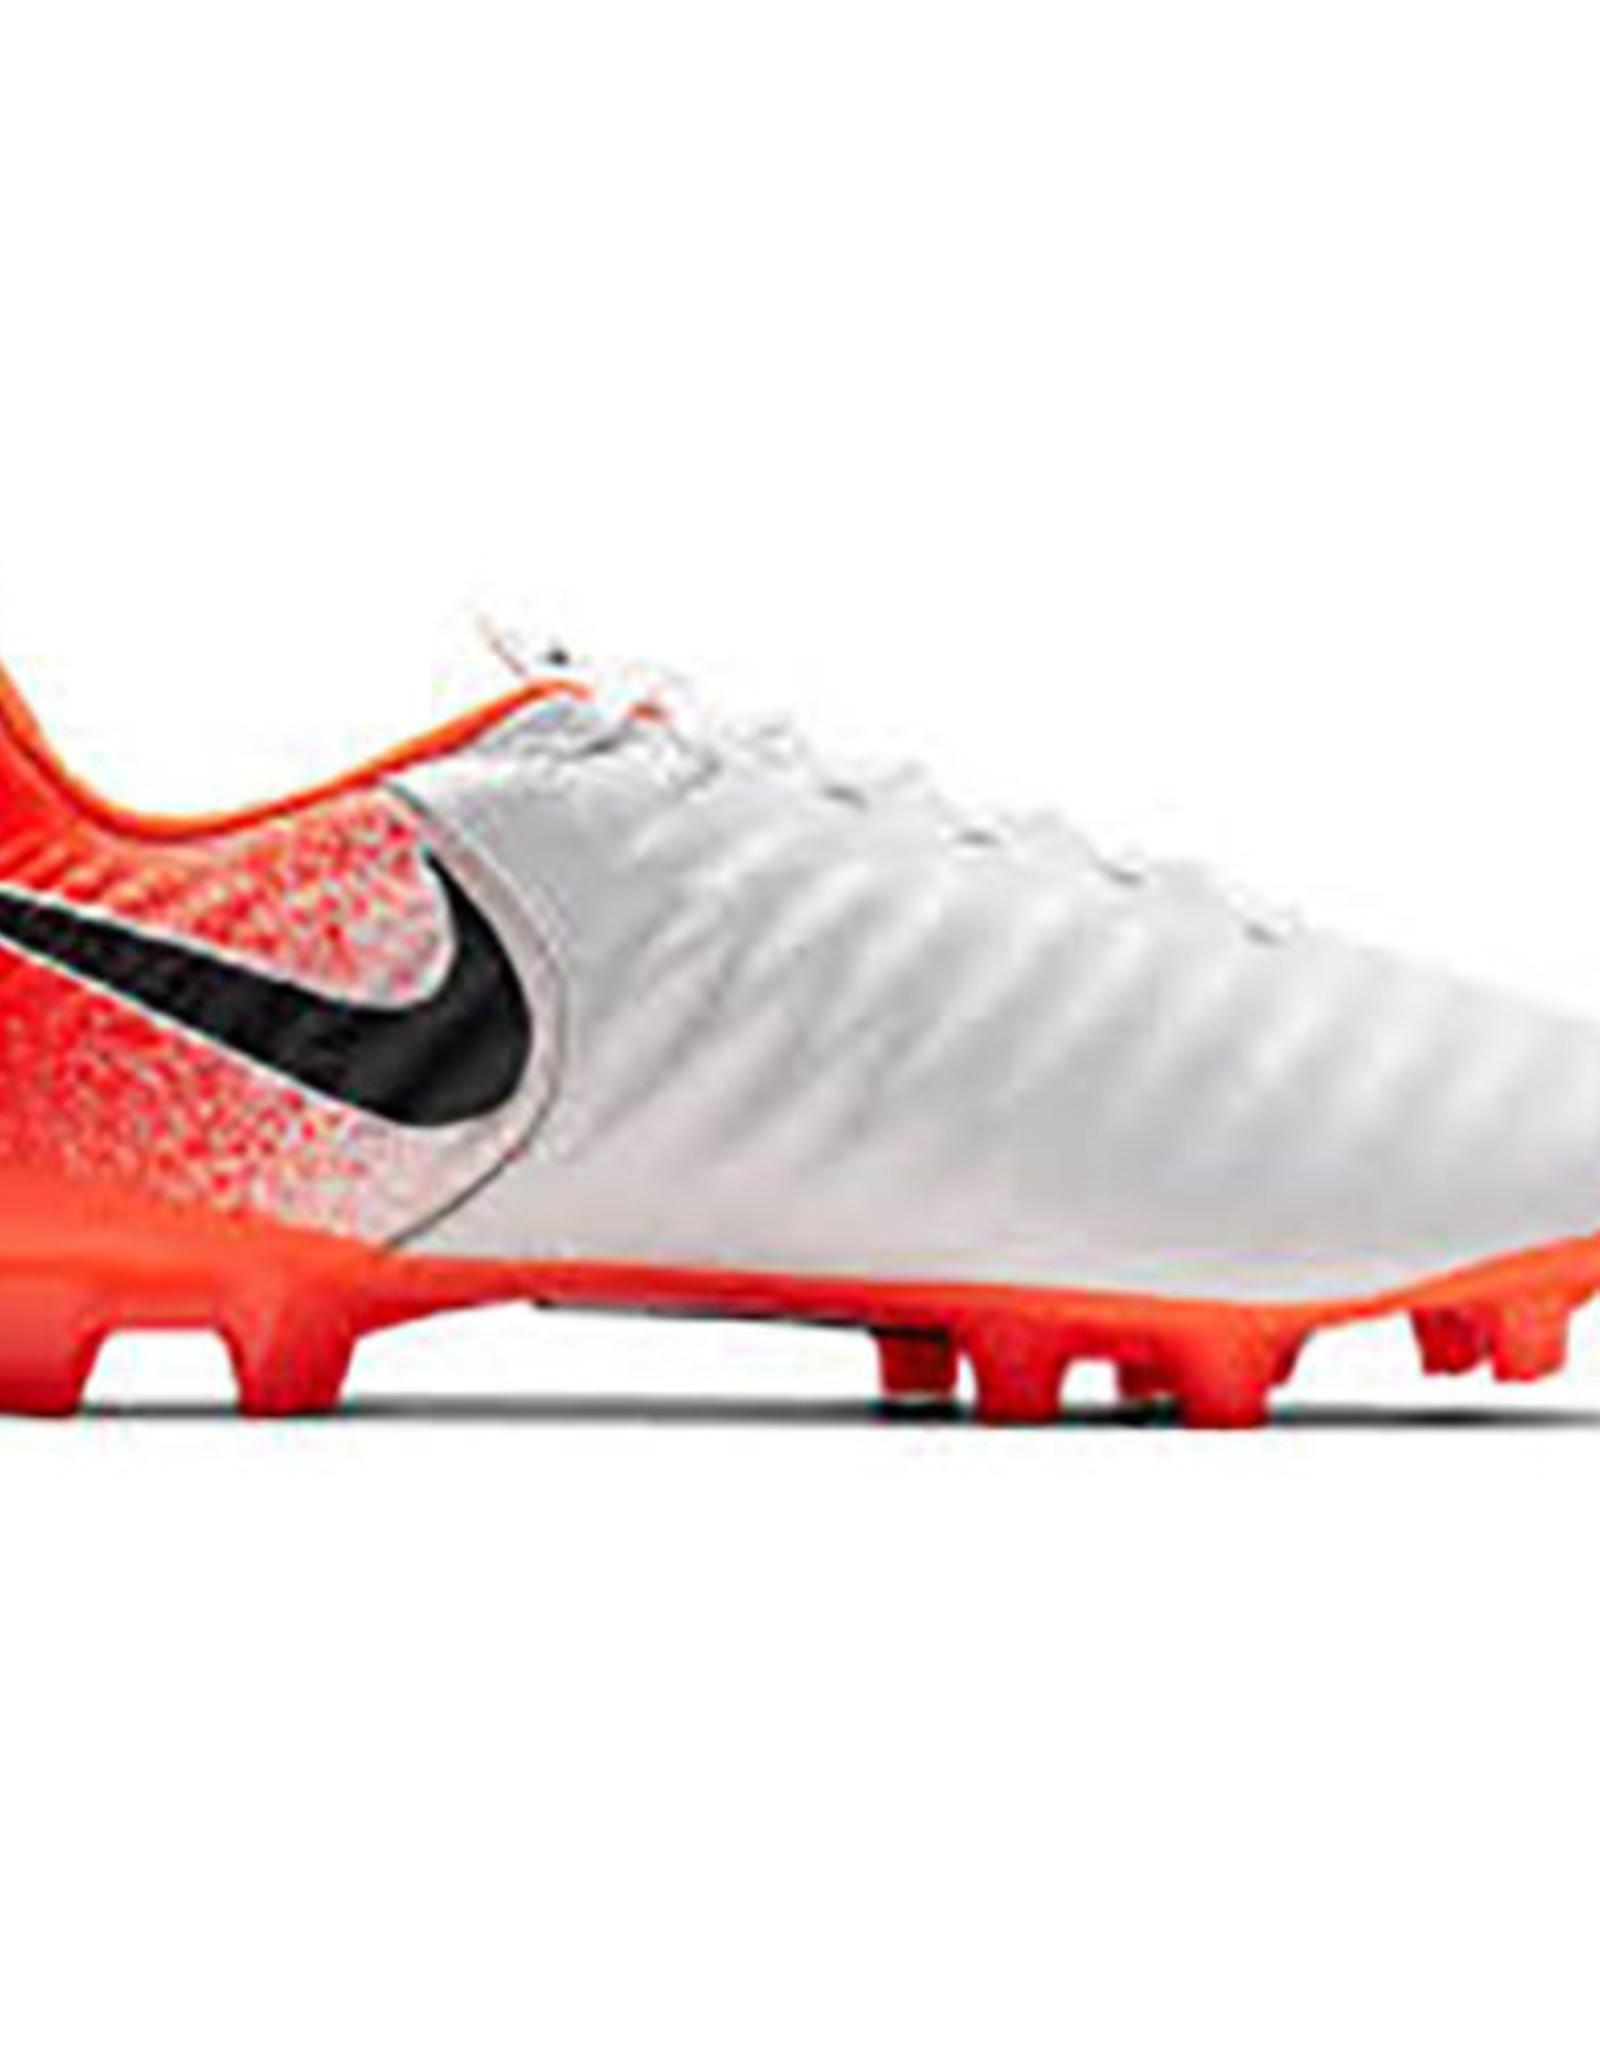 Nike Nike FG Legend Academy AH7242